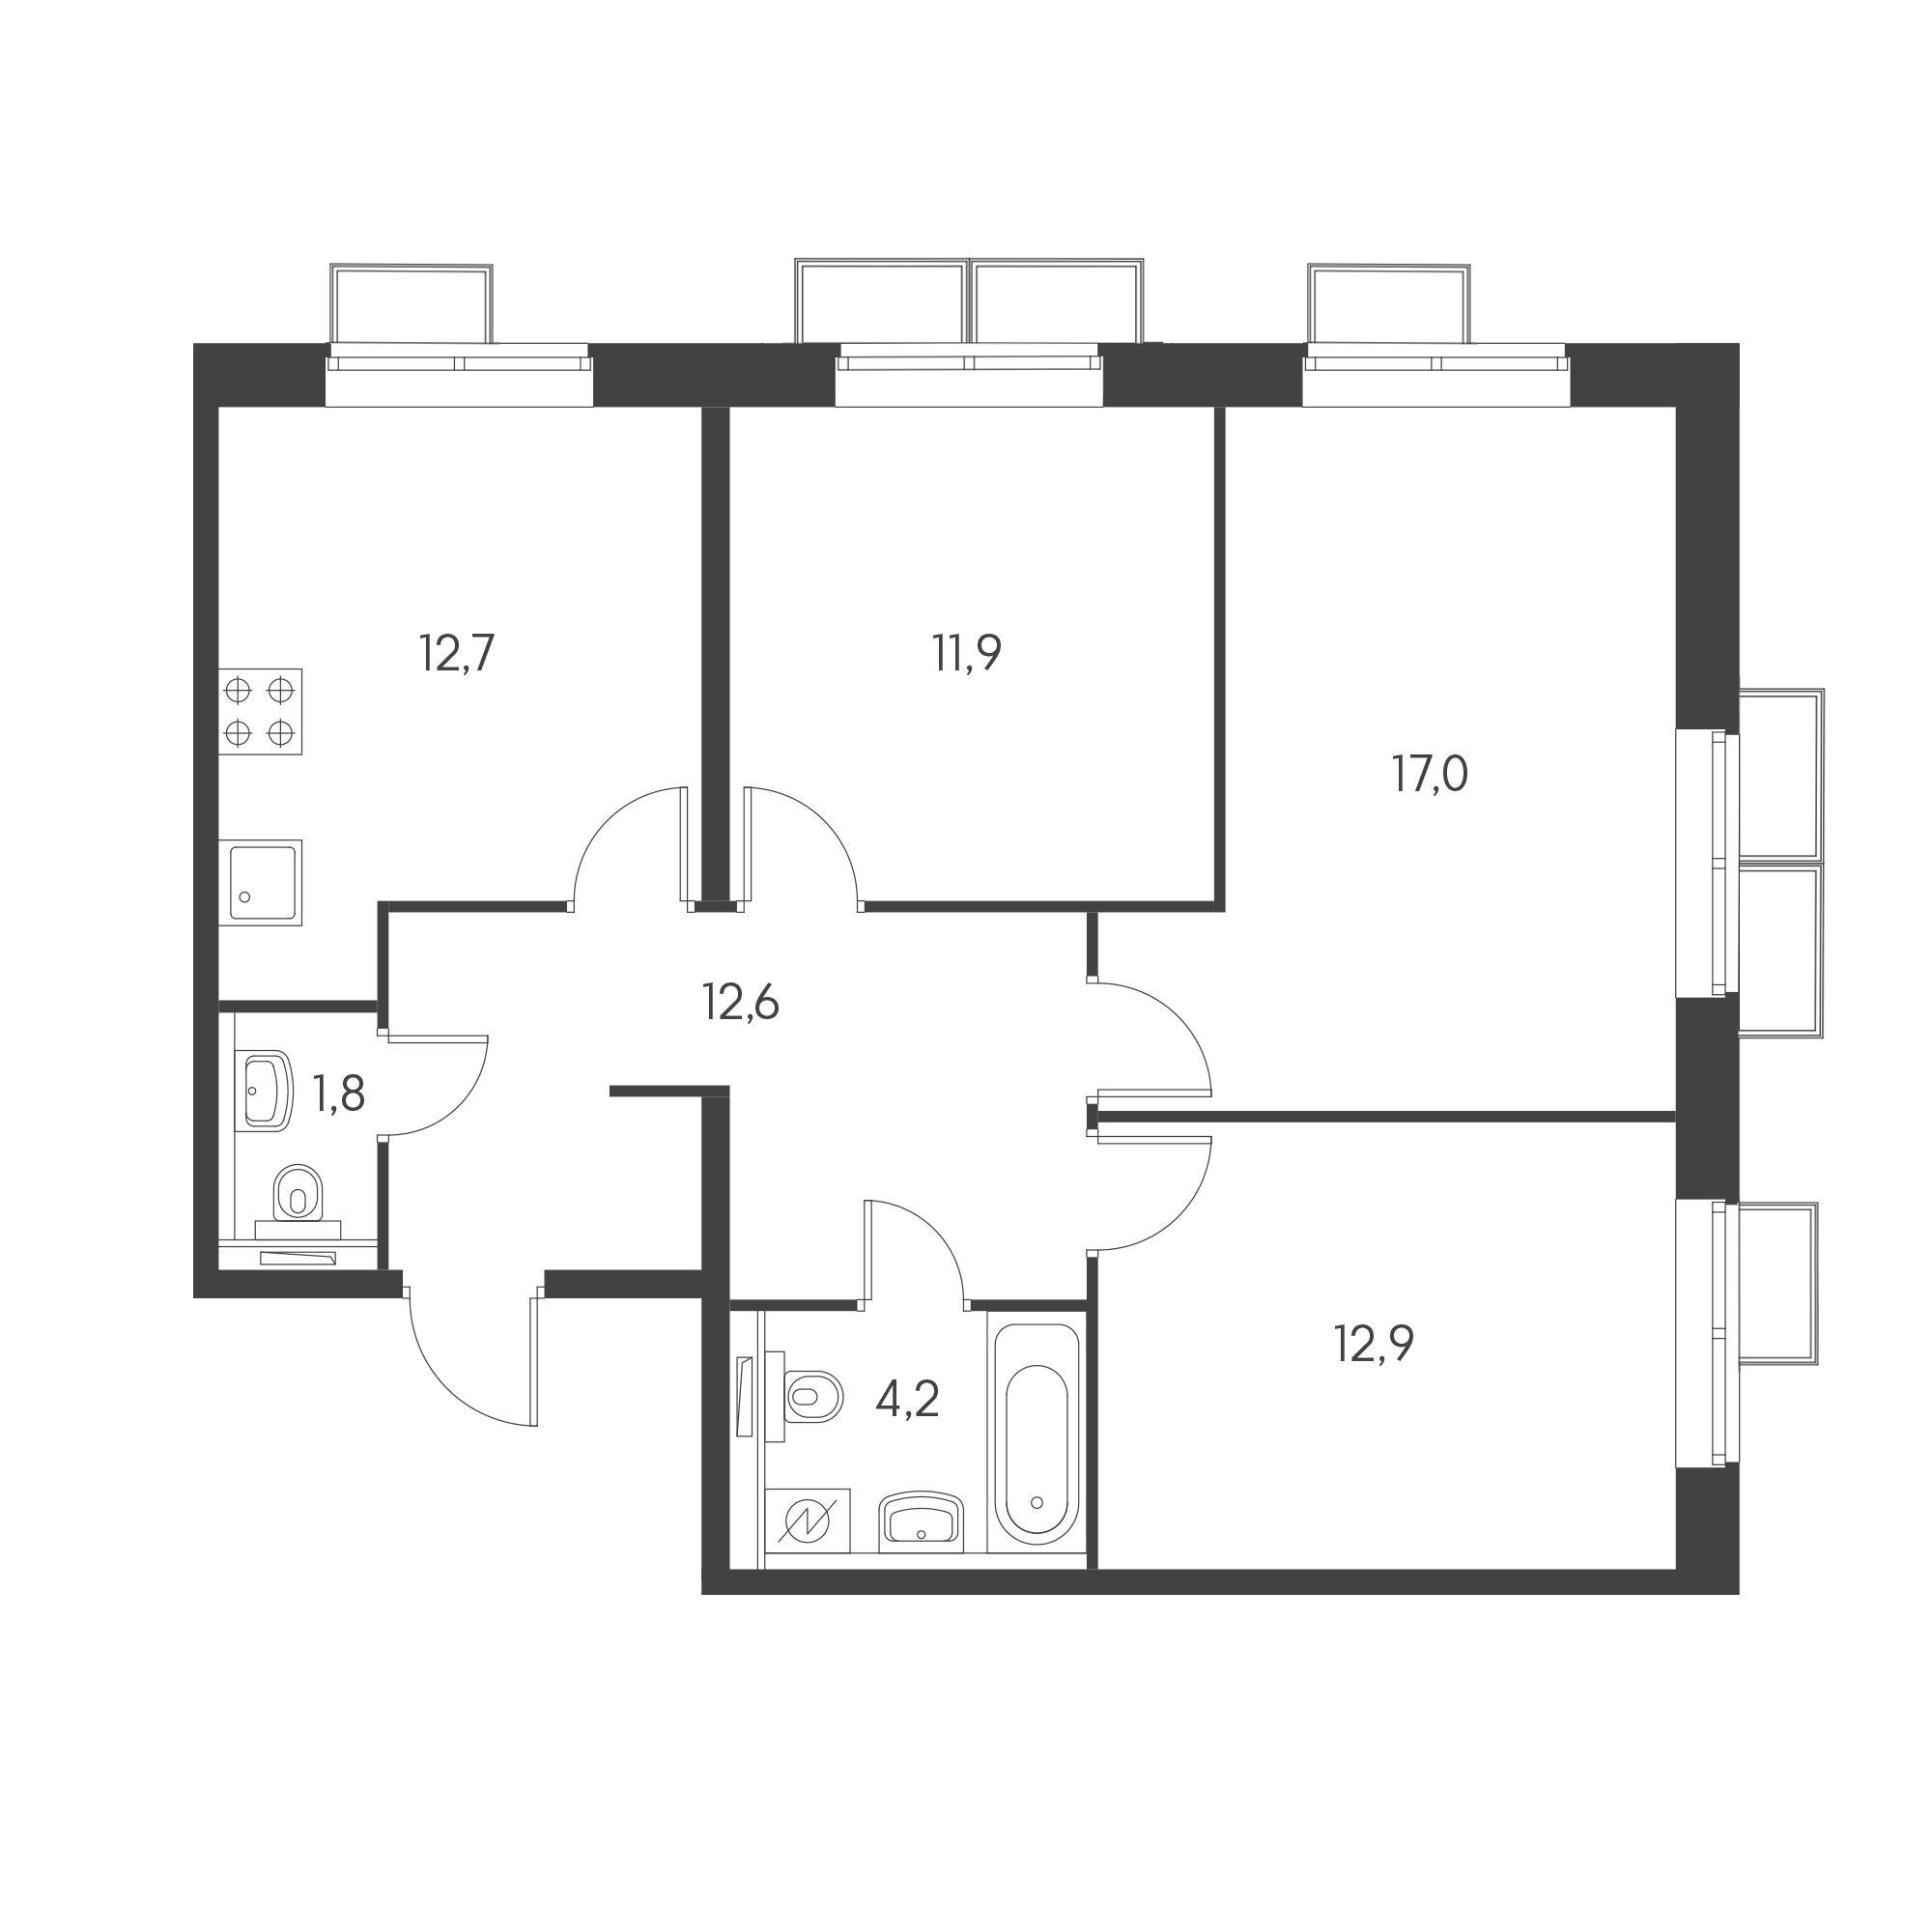 3KM24_10.5-2